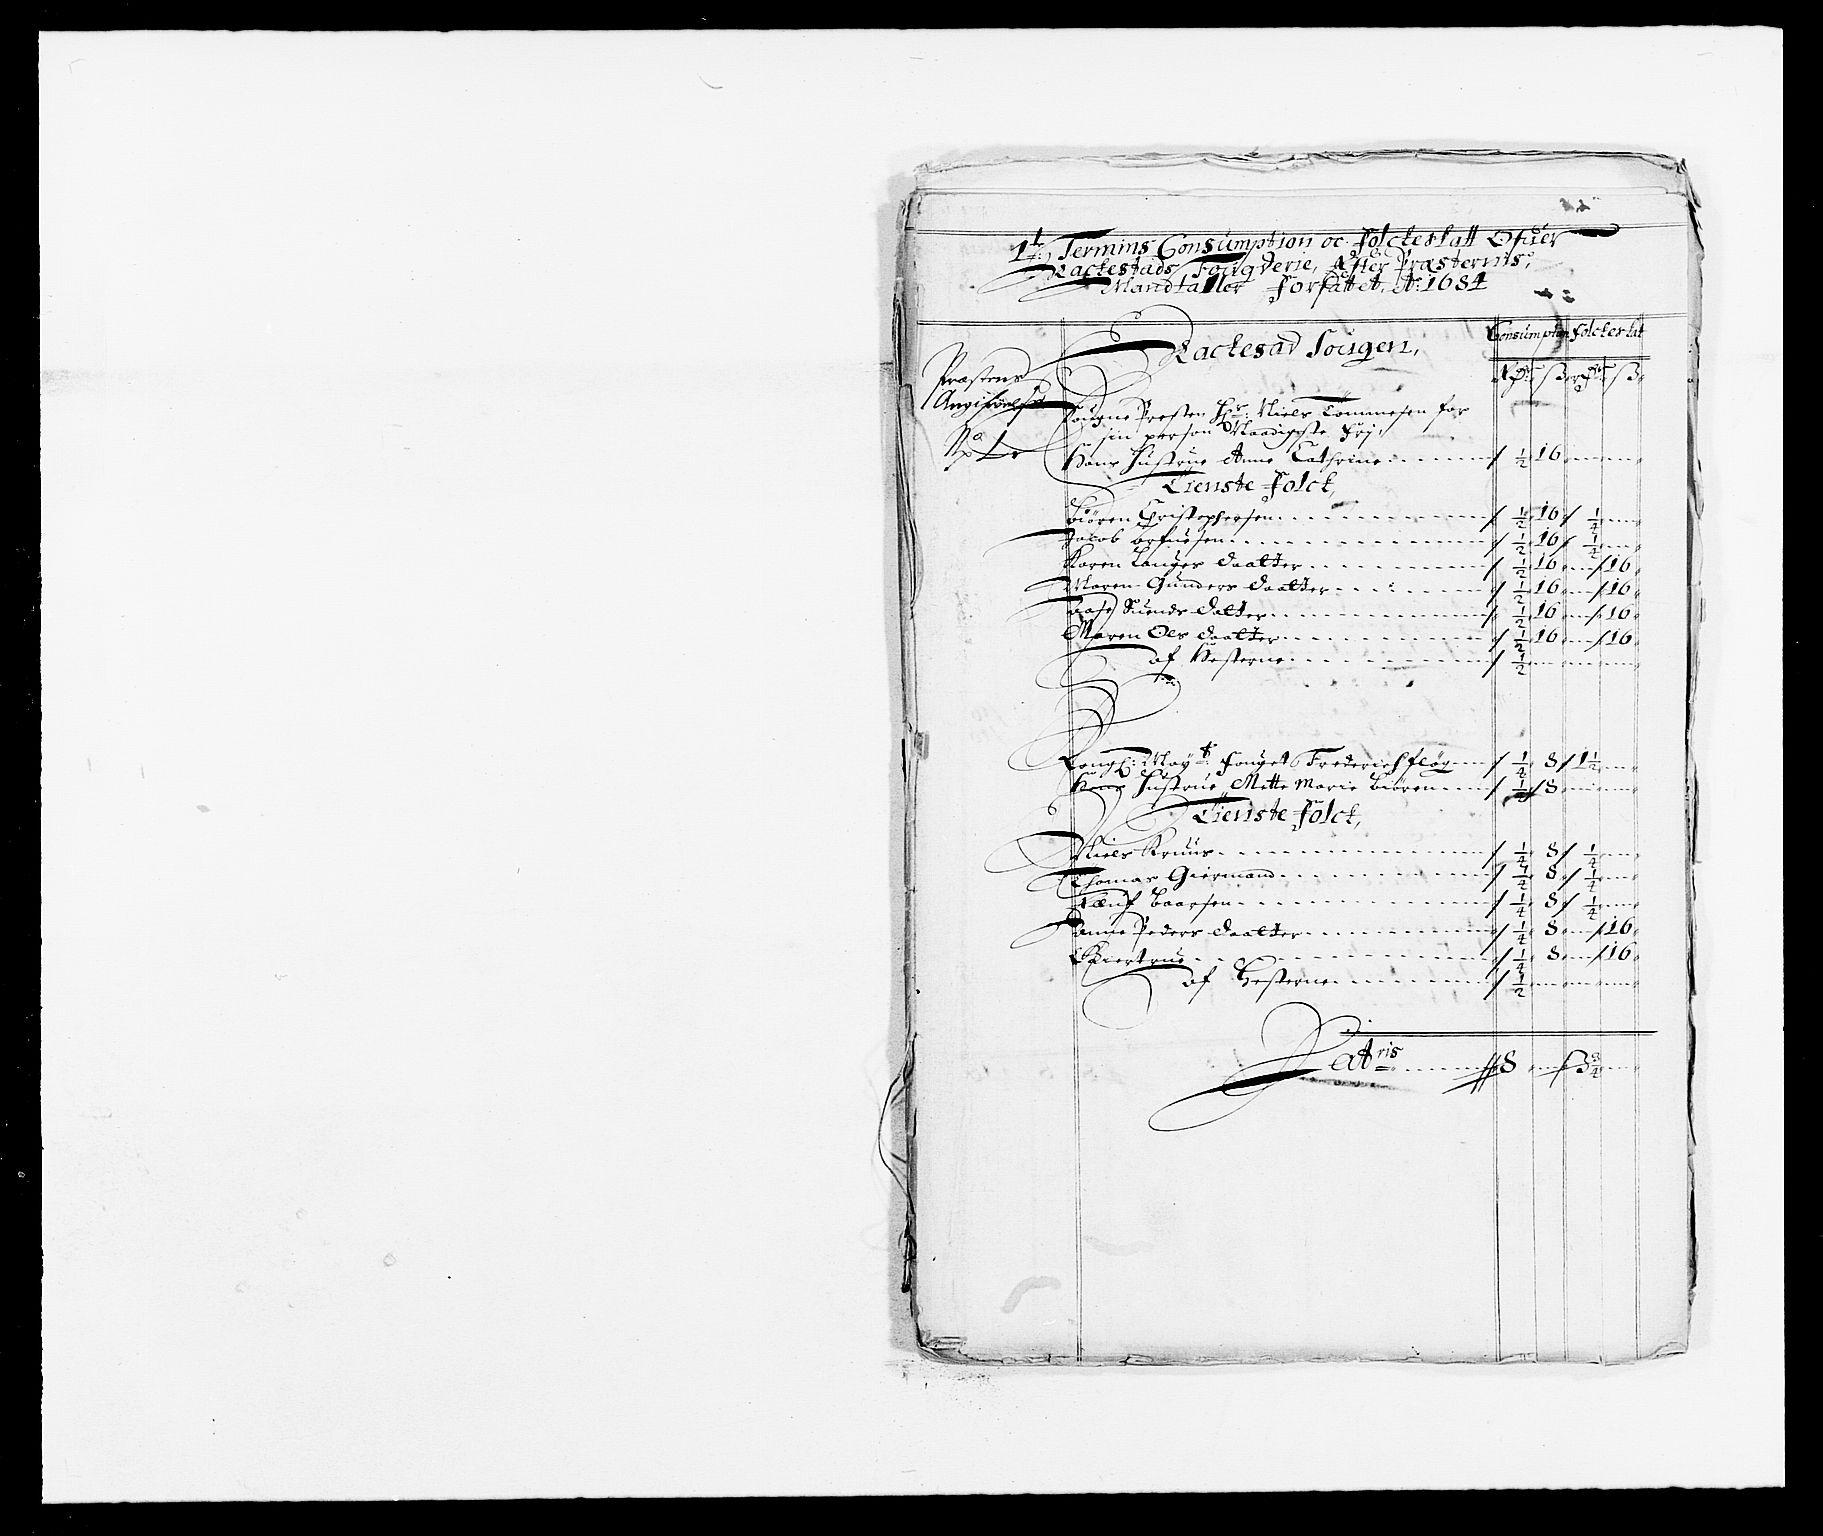 RA, Rentekammeret inntil 1814, Reviderte regnskaper, Fogderegnskap, R05/L0274: Fogderegnskap Rakkestad, 1683-1684, s. 348